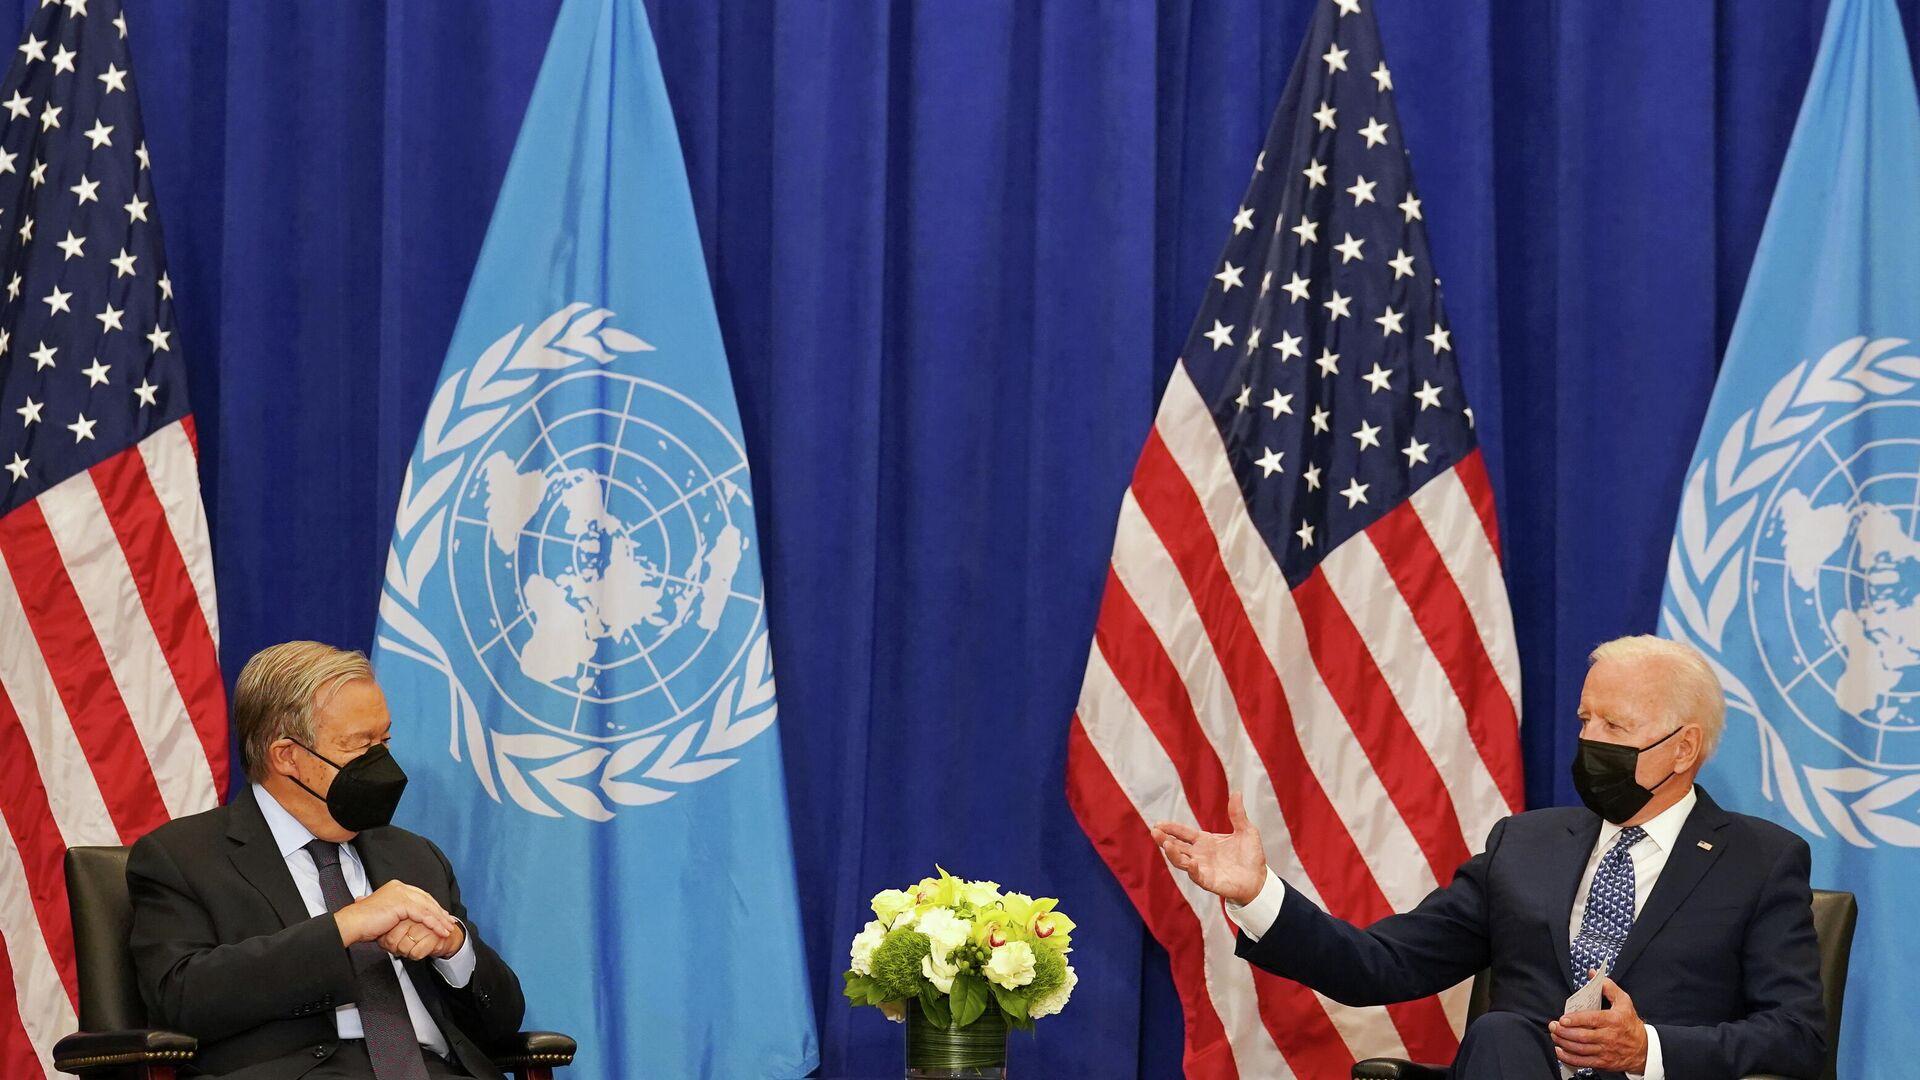 U.S. President Joe Biden meets with United Nations Secretary-General Antonio Guterres at the 76th Session of the U.N. General Assembly in New York City, U.S., September 20, 2021 - Sputnik International, 1920, 21.09.2021